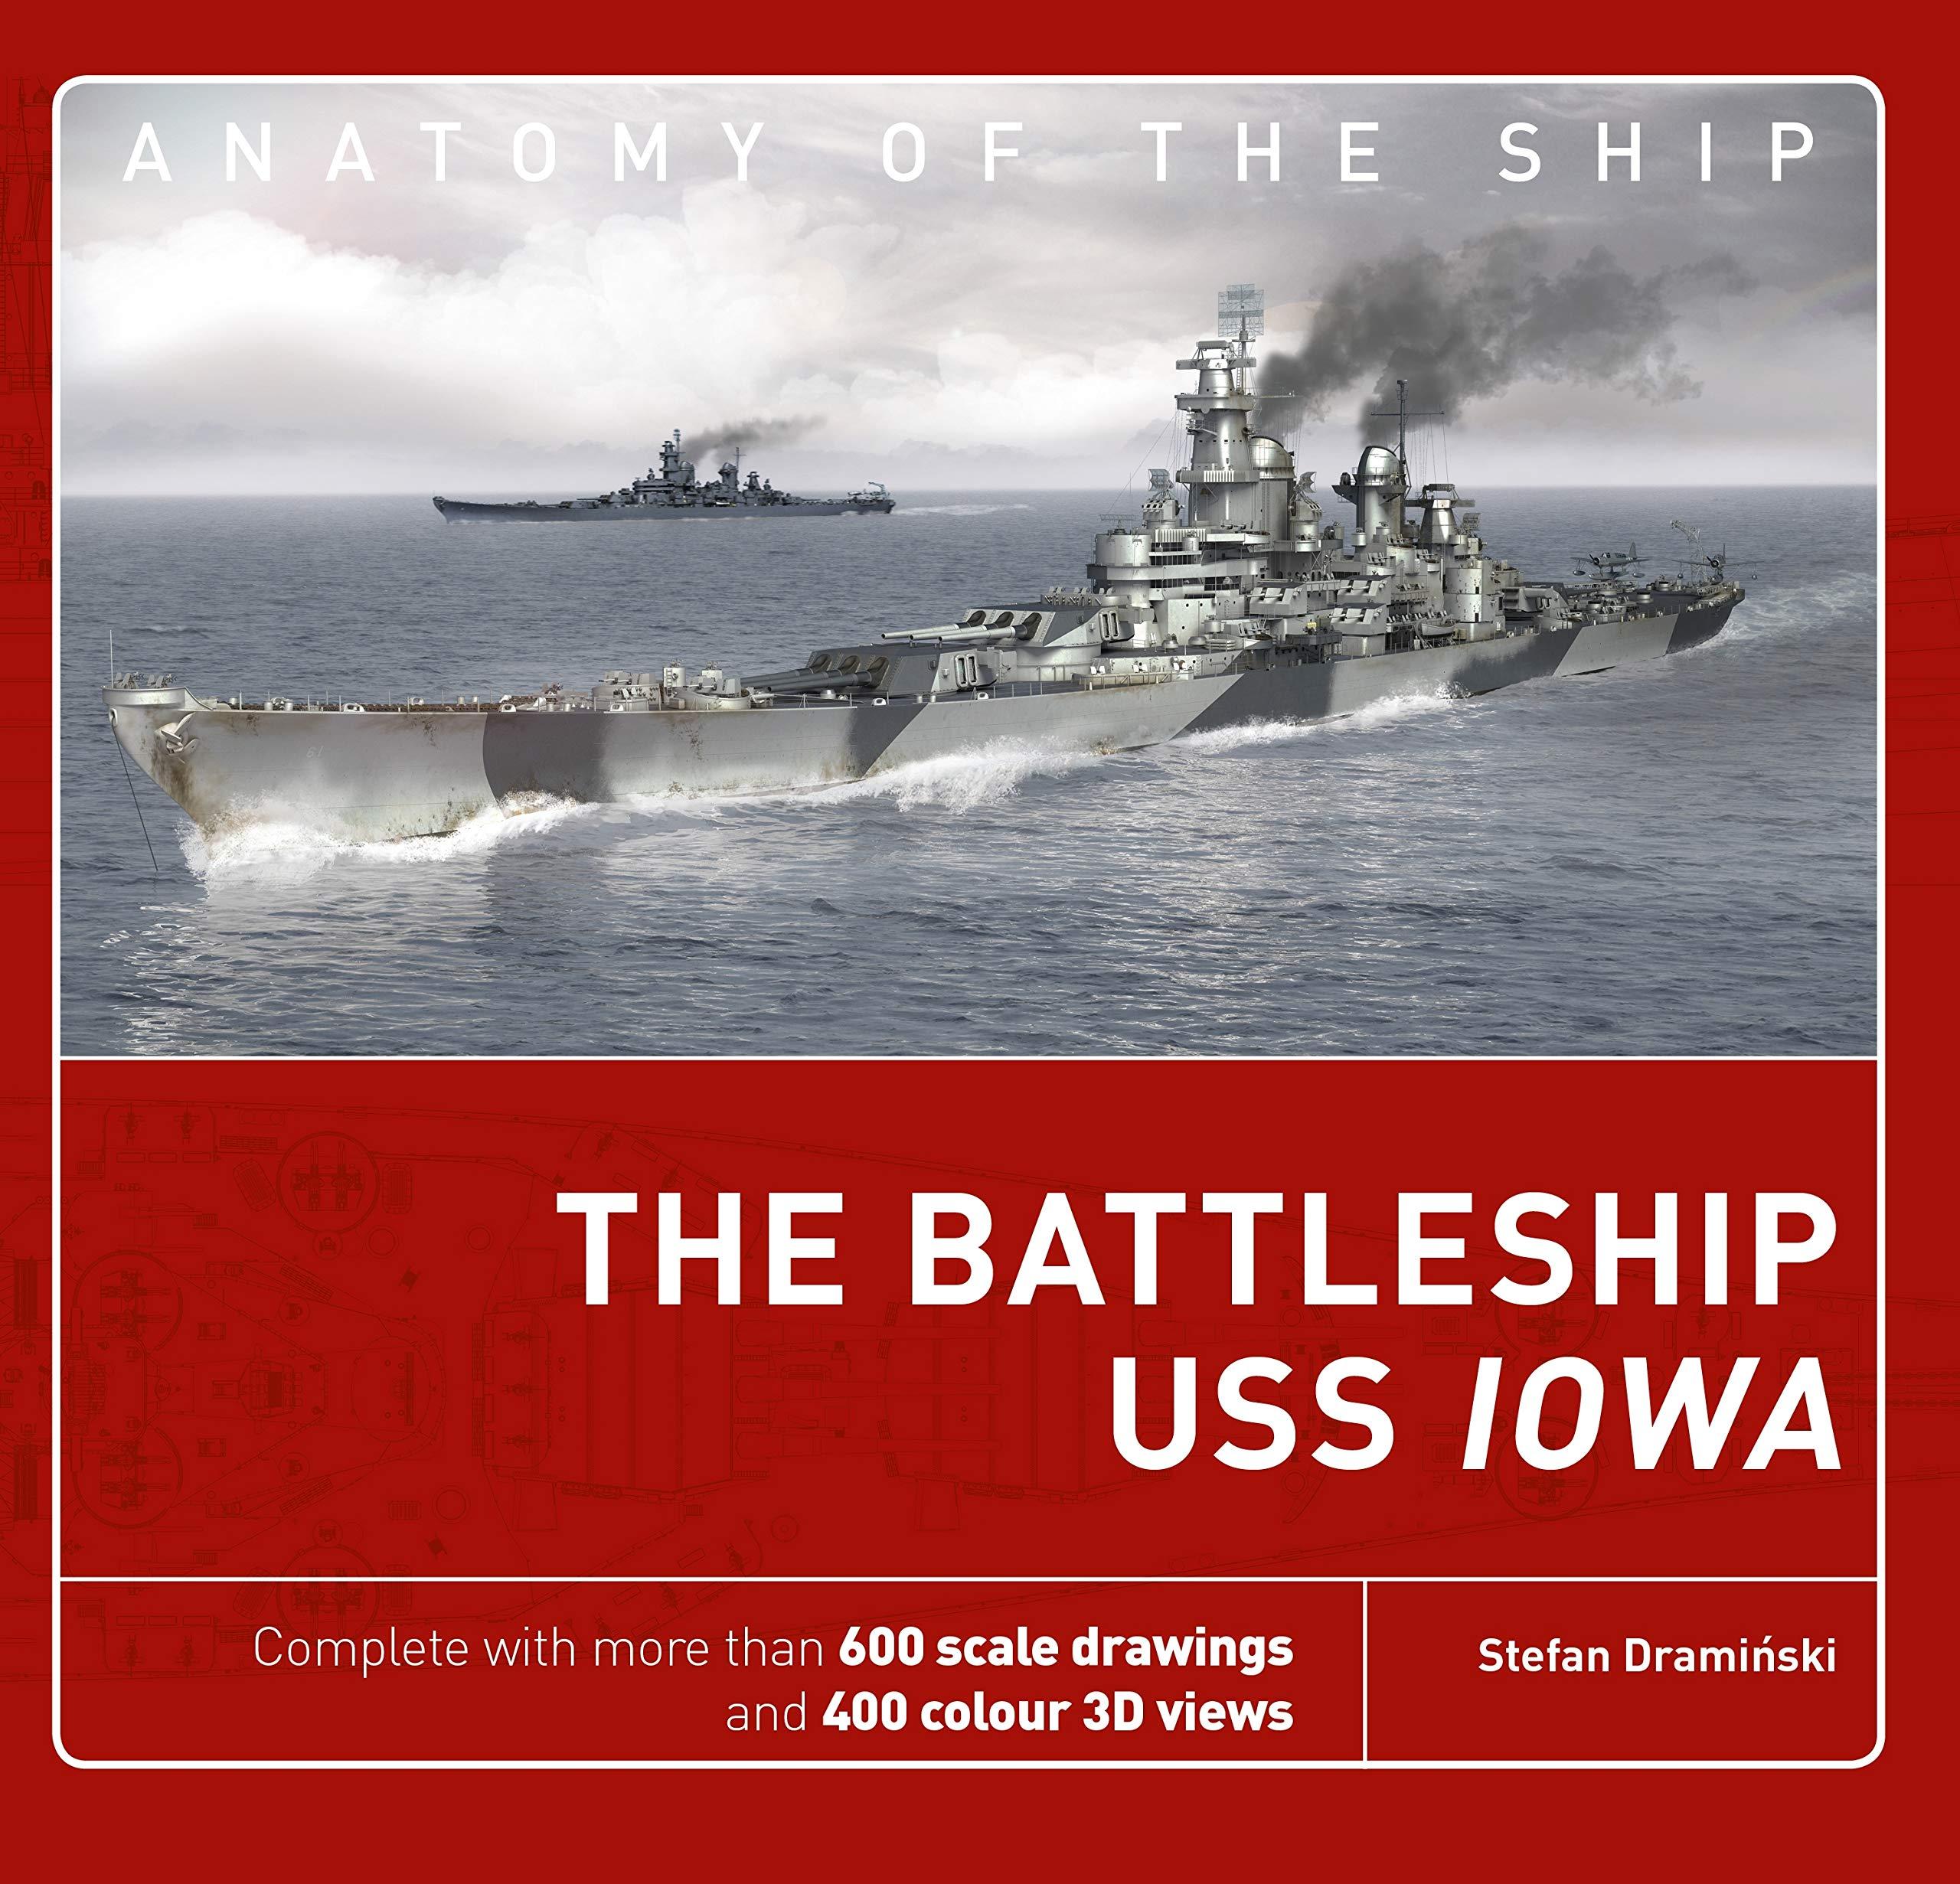 The Battleship USS Iowa (Anatomy of The Ship) by Osprey Publishing